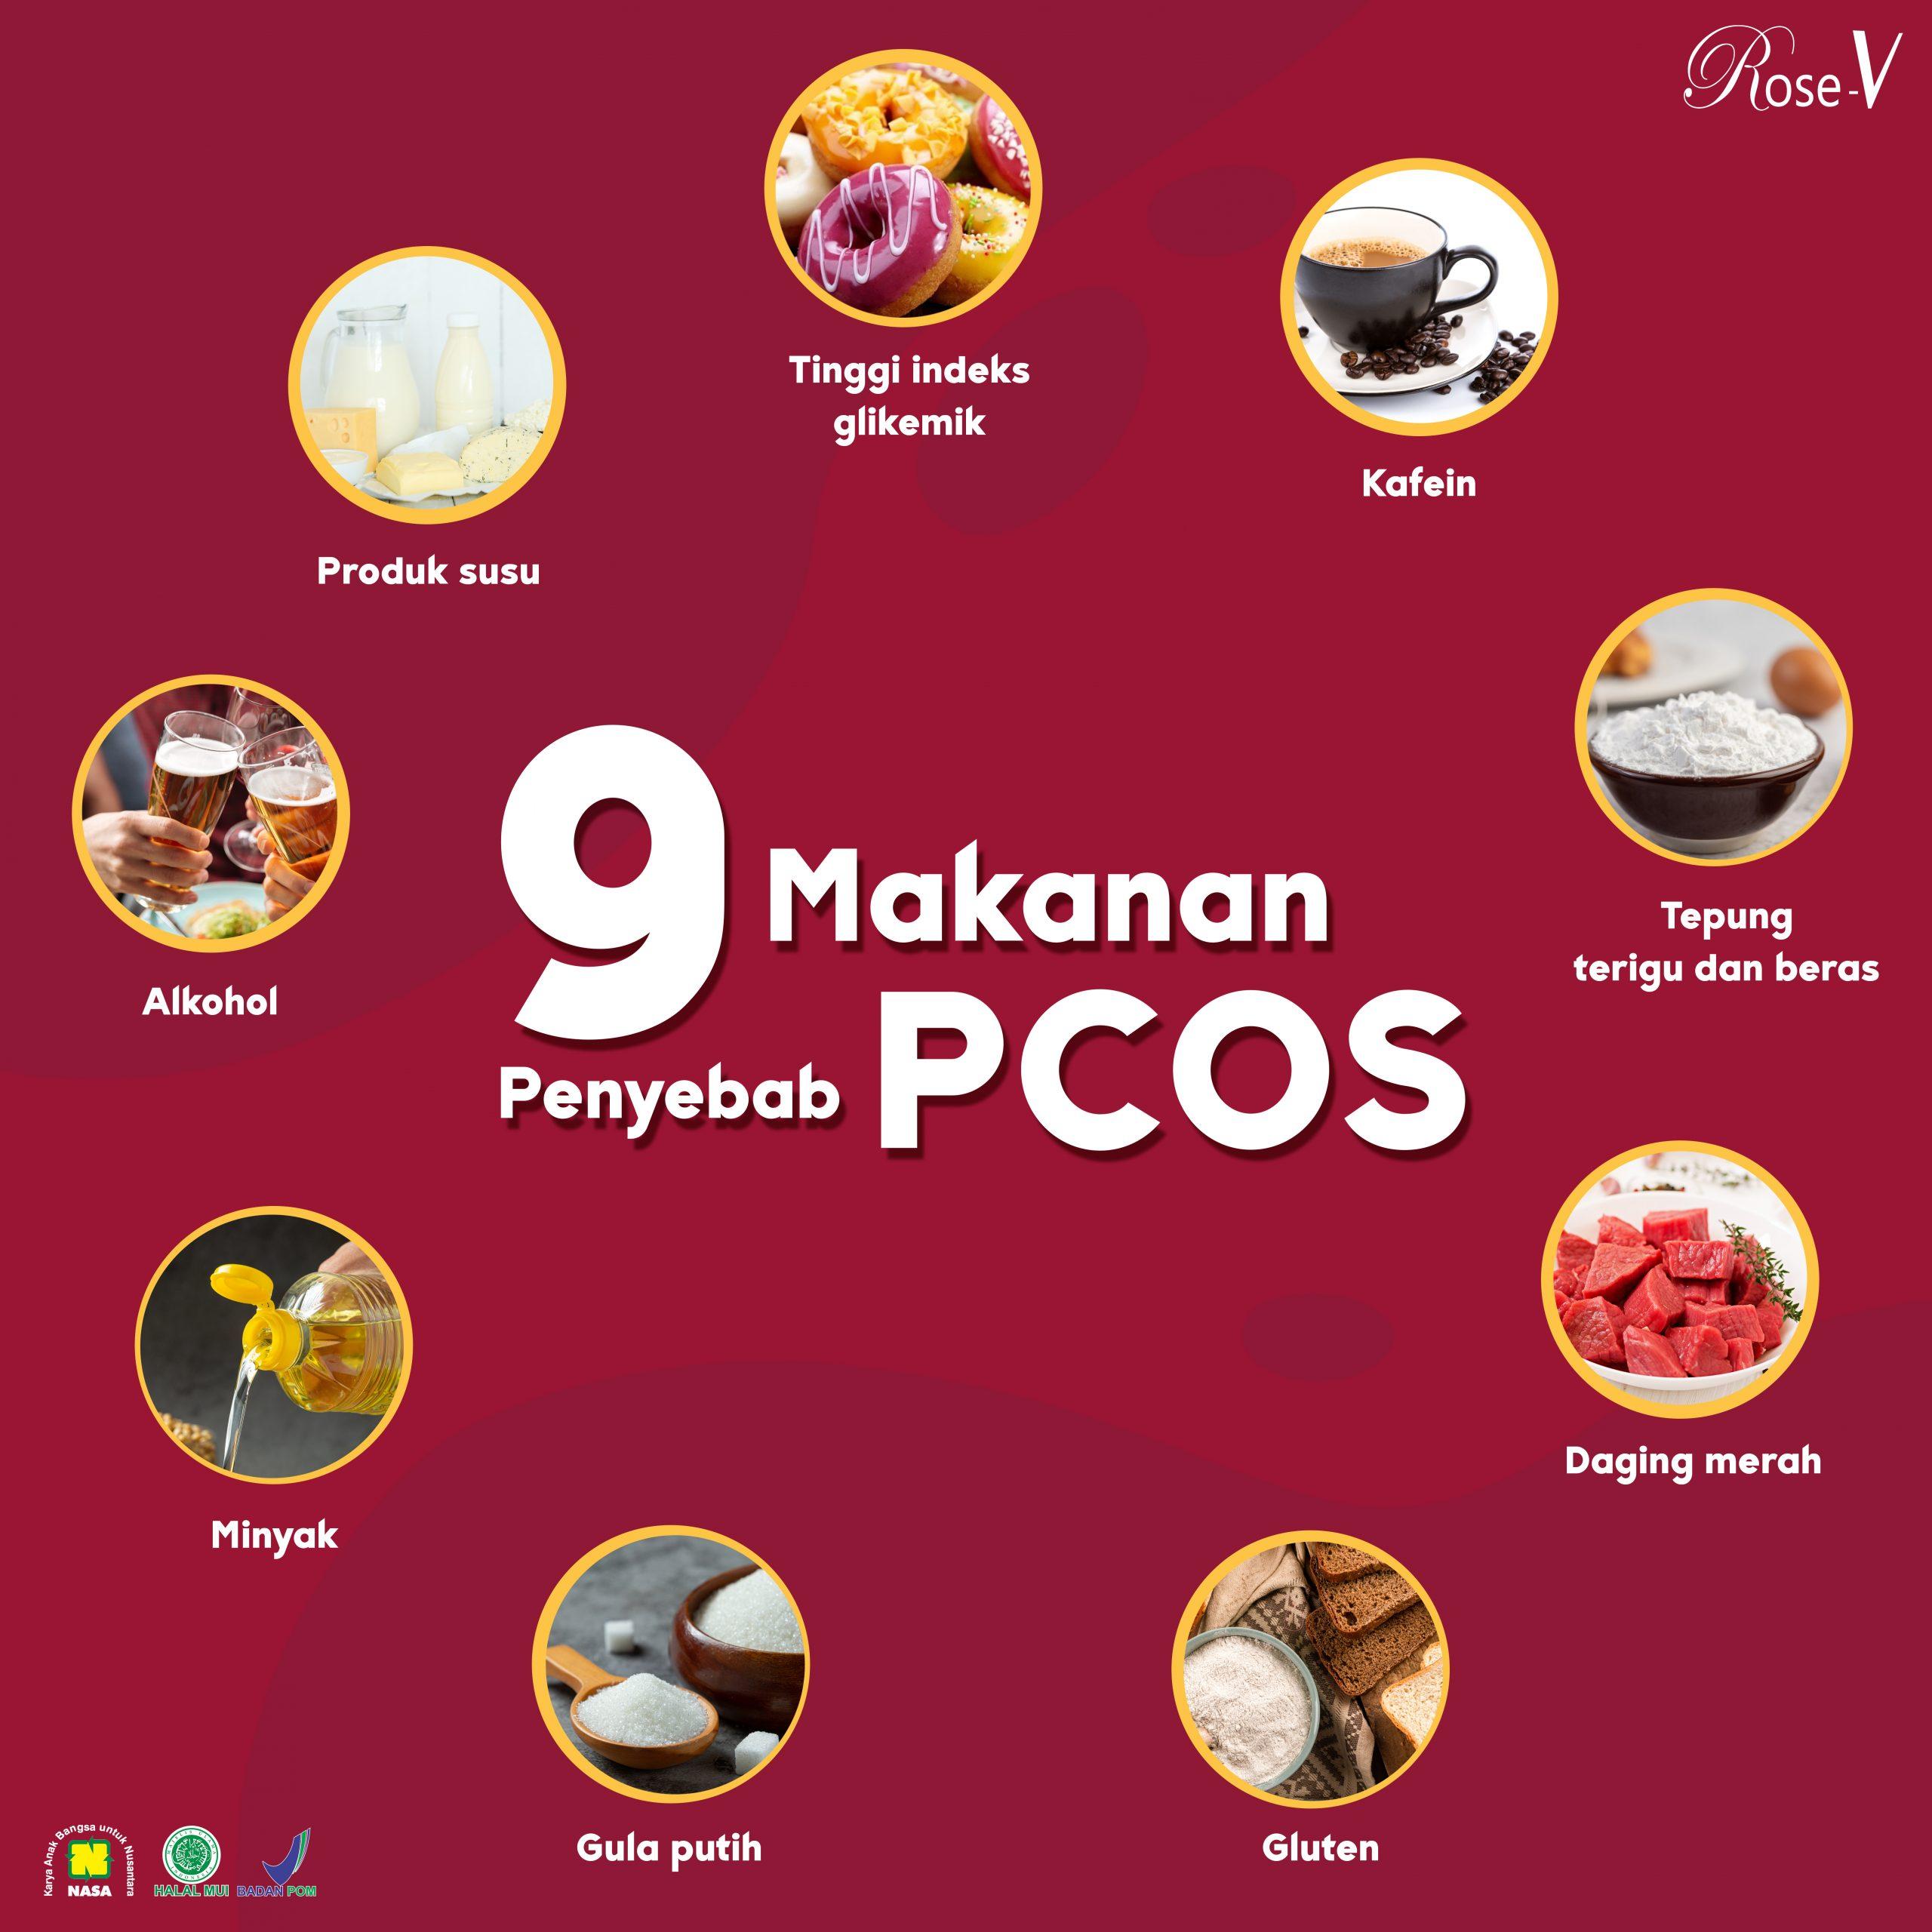 Makanan Yang Dapat Memicu PCOS